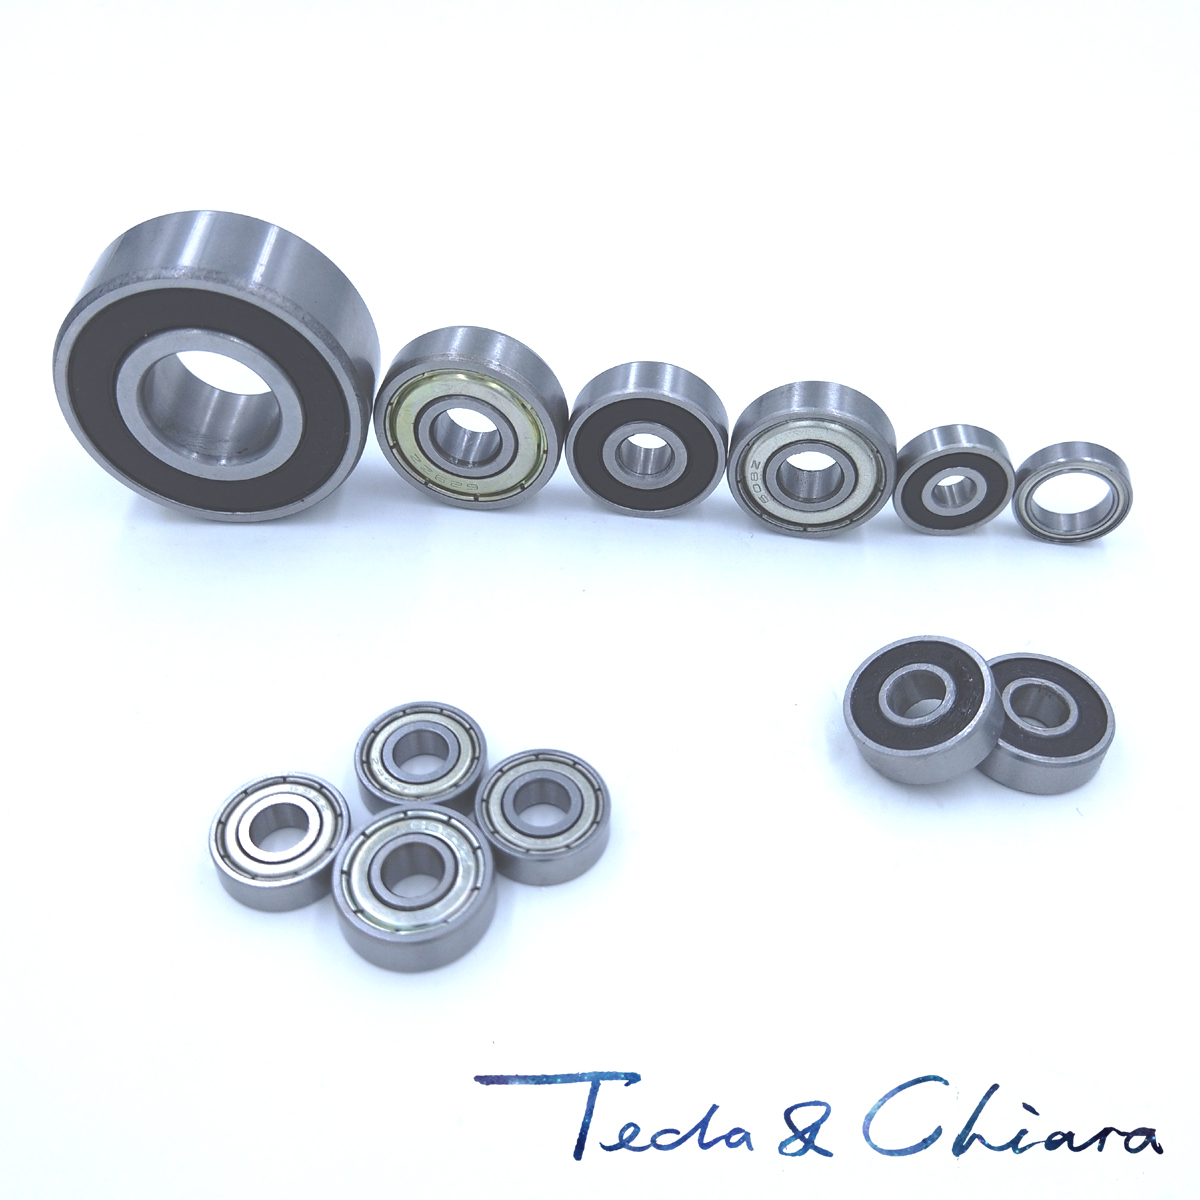 605 605ZZ 605RS 605-2Z 605Z 605-2RS ZZ RS RZ 2RZ Deep Groove Ball Bearings 5 X 14 X 5mm